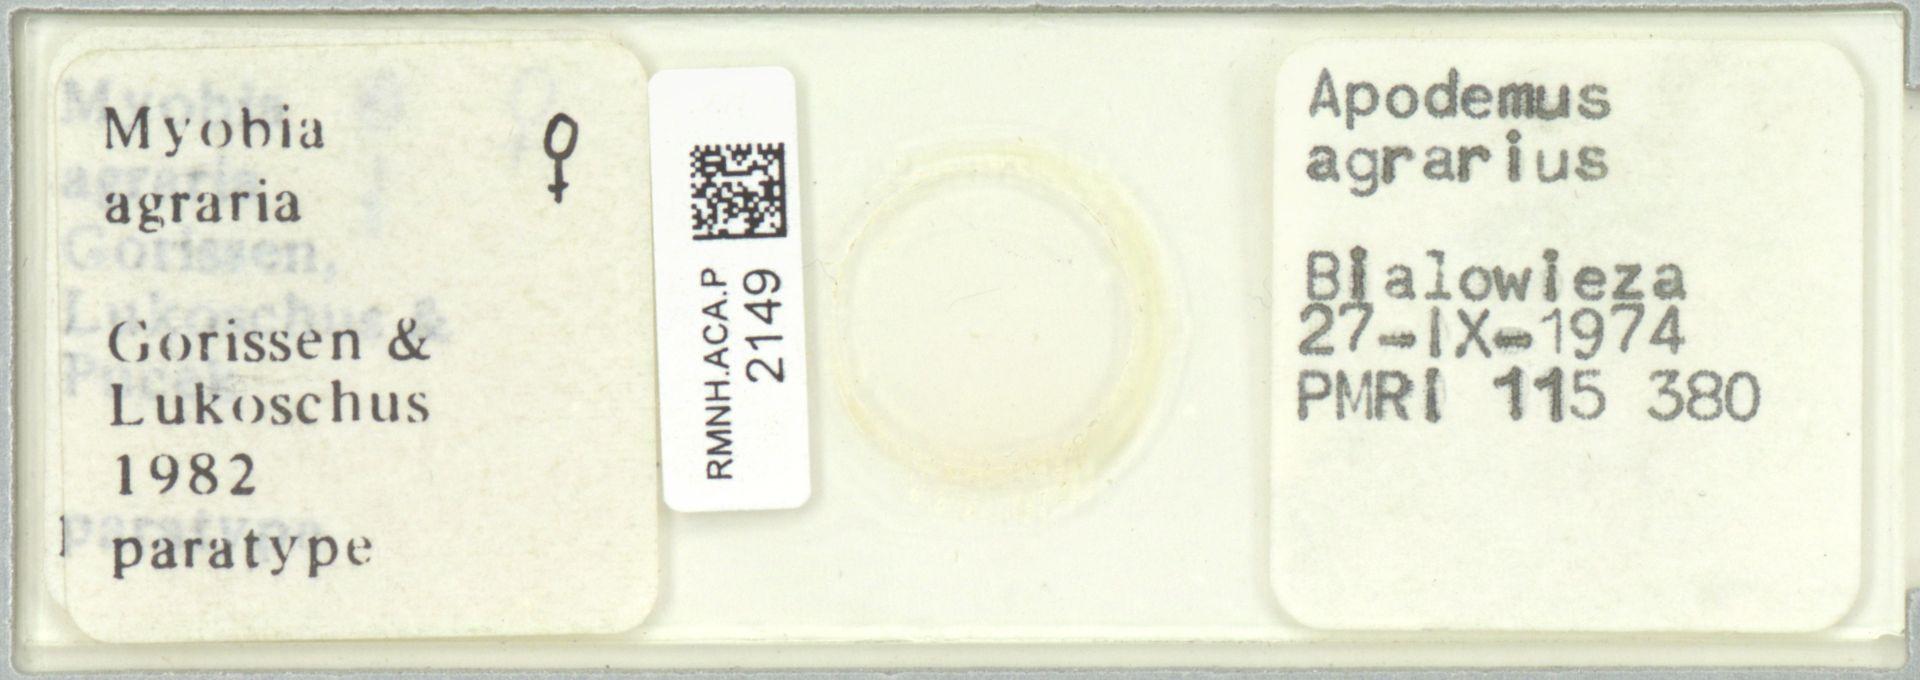 RMNH.ACA.P.2149   Myobia agraria Gorissen & Lukoschus, 1983